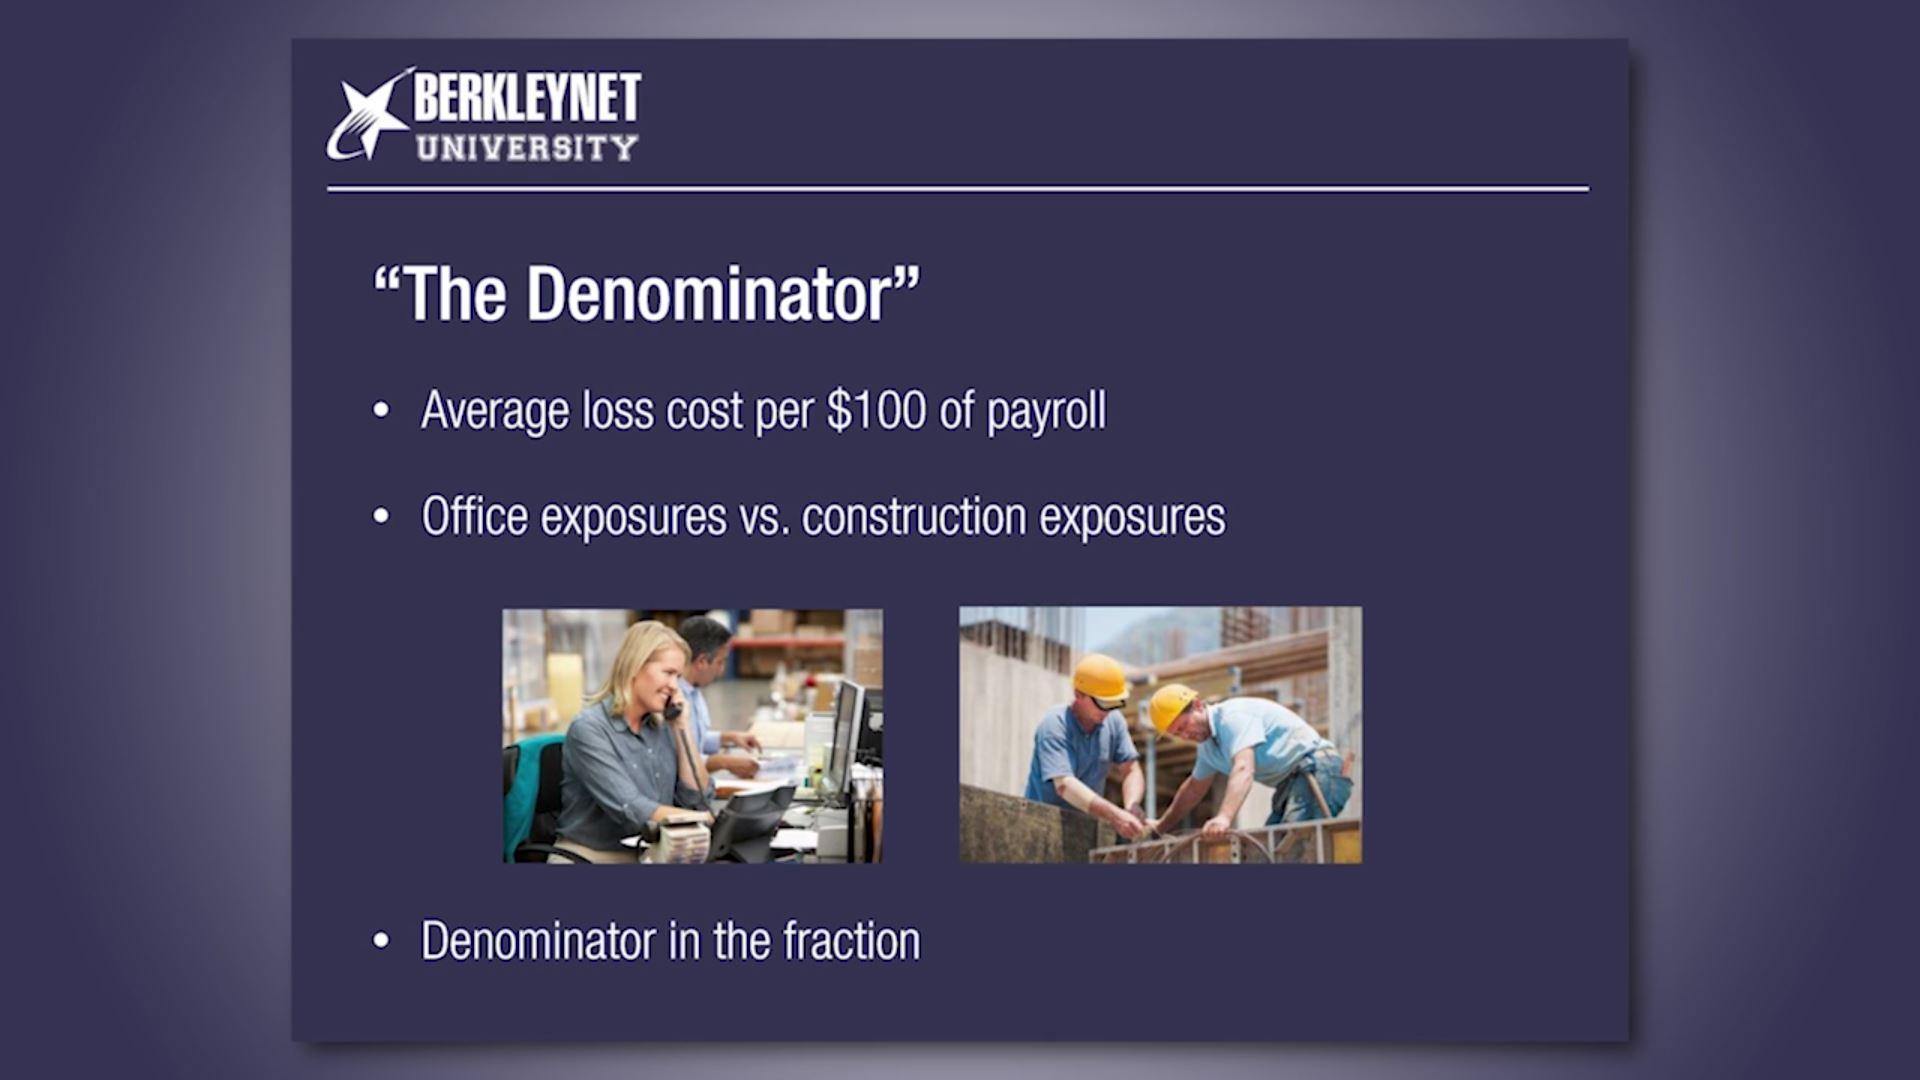 BerkleyNet University